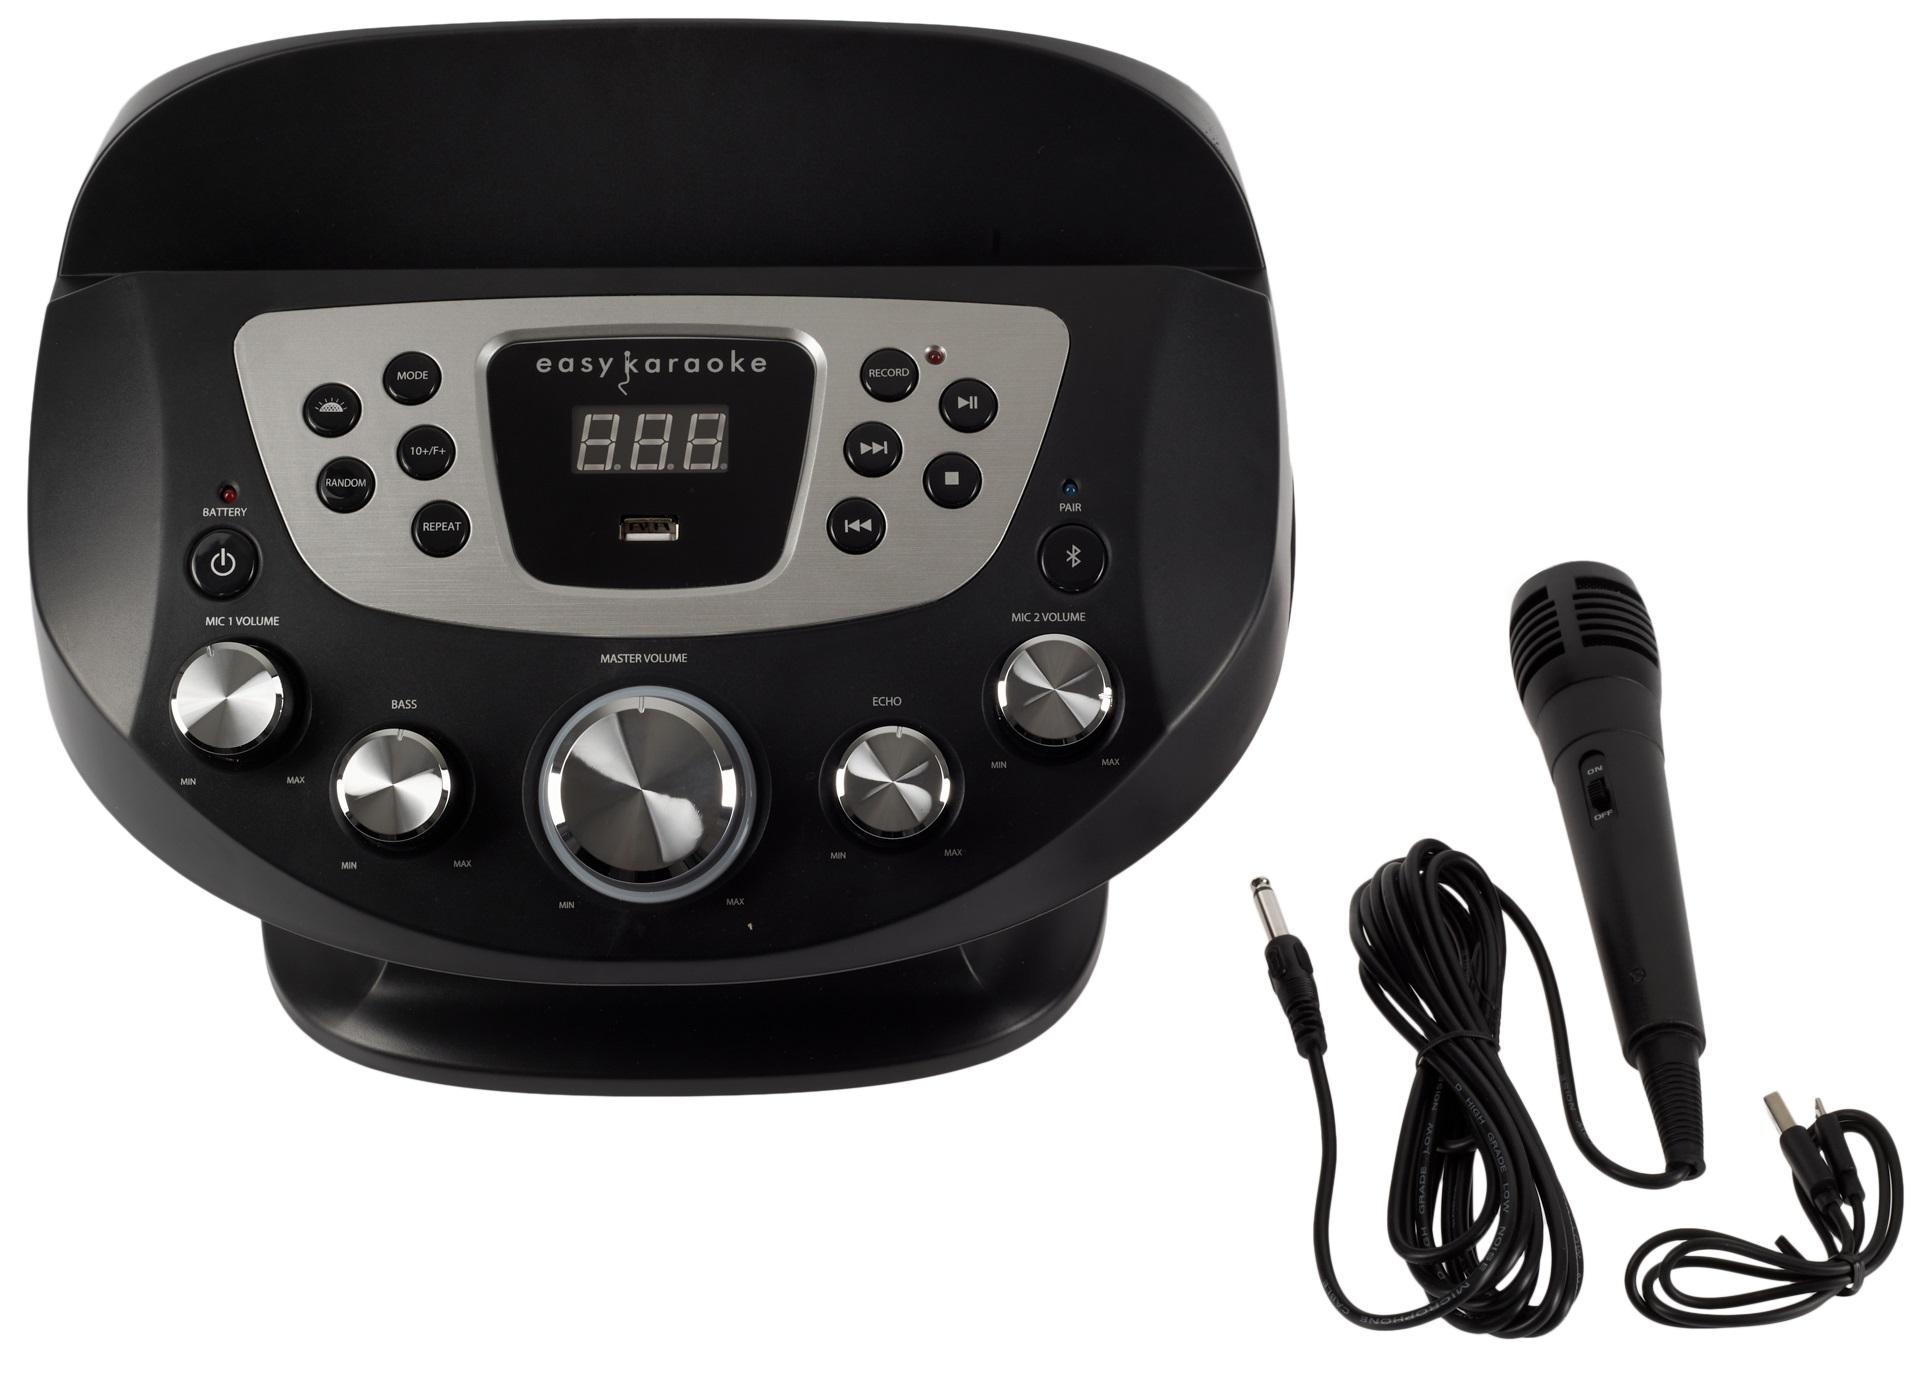 Easy Karaoke EKS282 BT